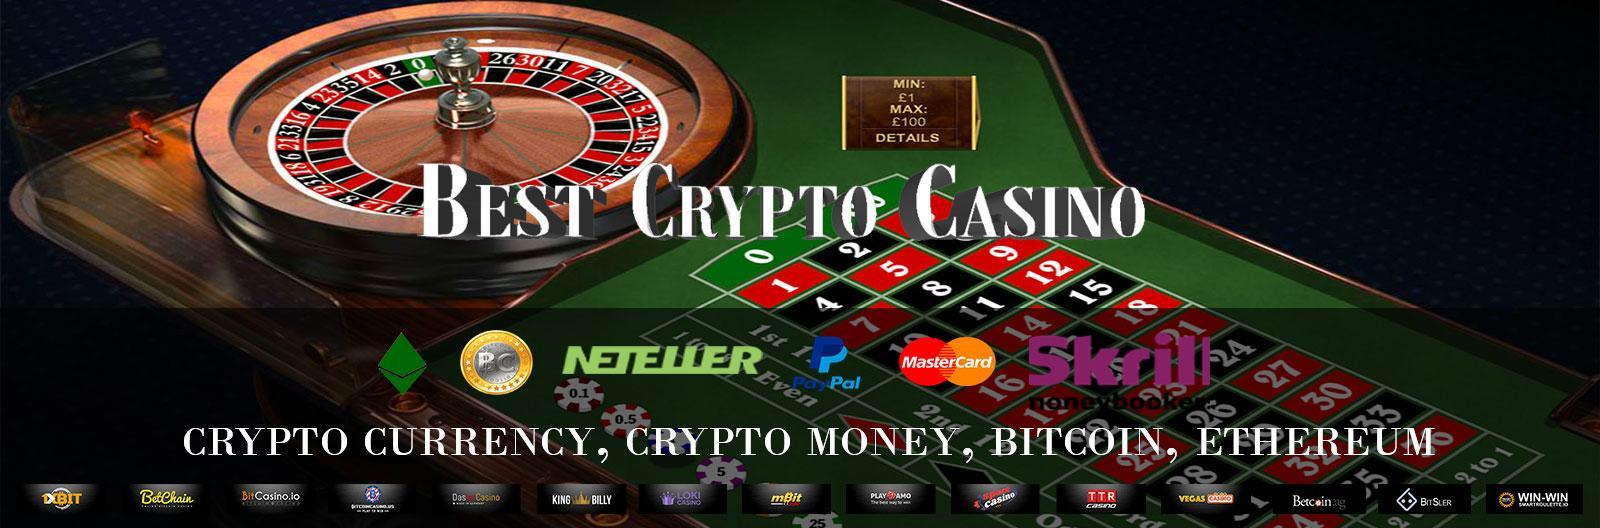 Best casino to visit macau